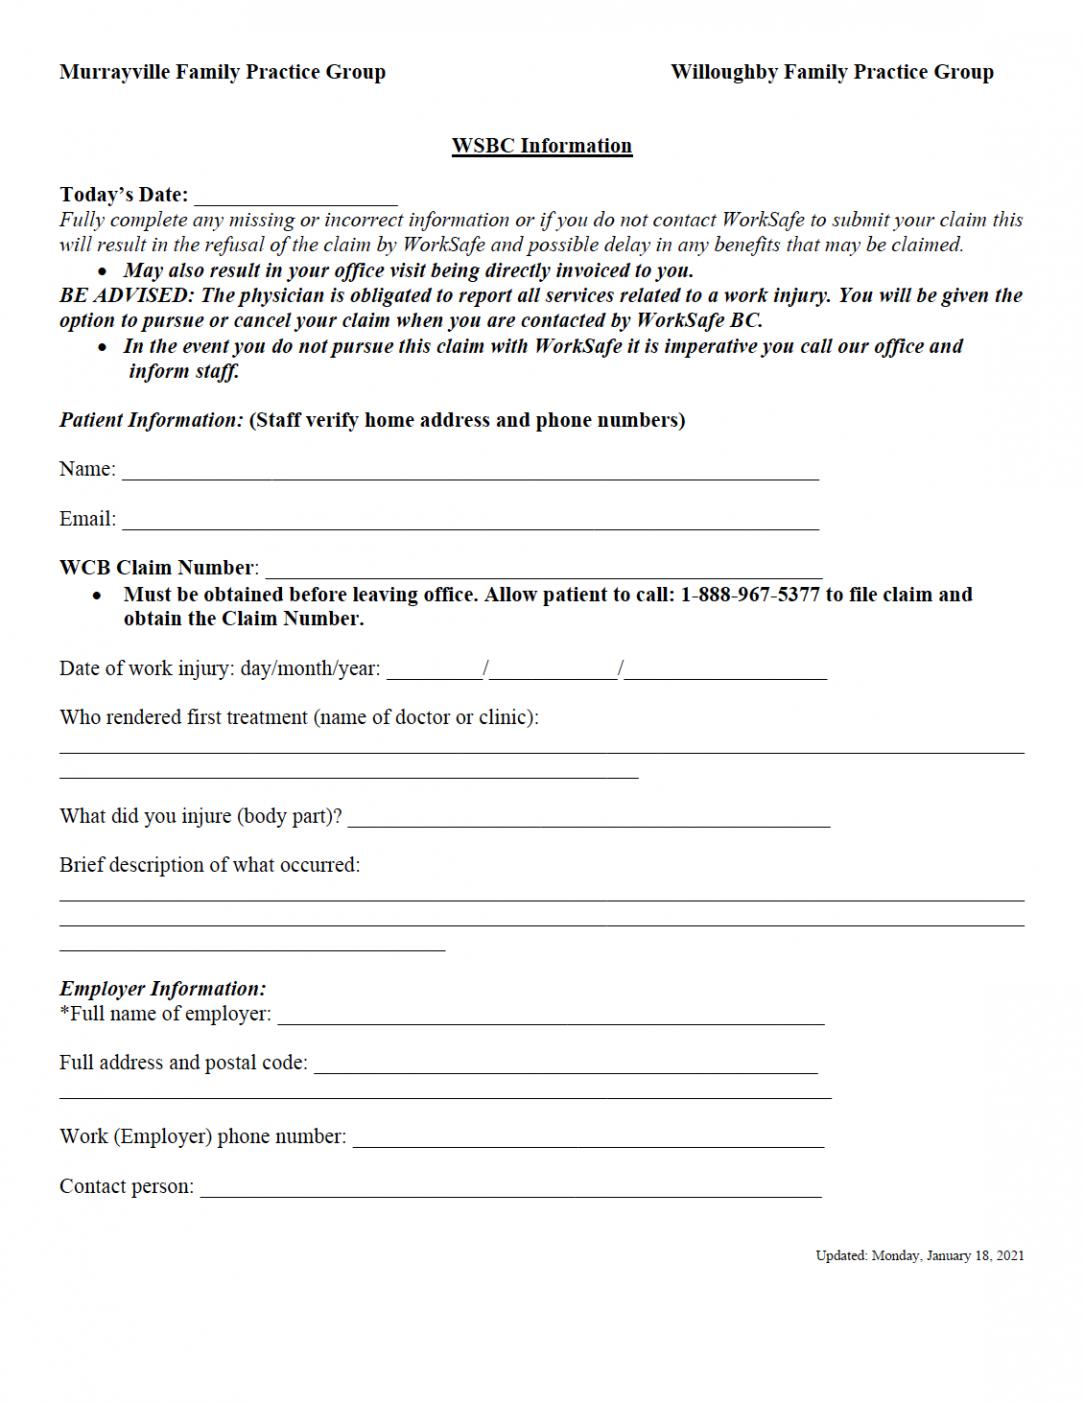 Worksafe Bc (WSBC) Patient Information